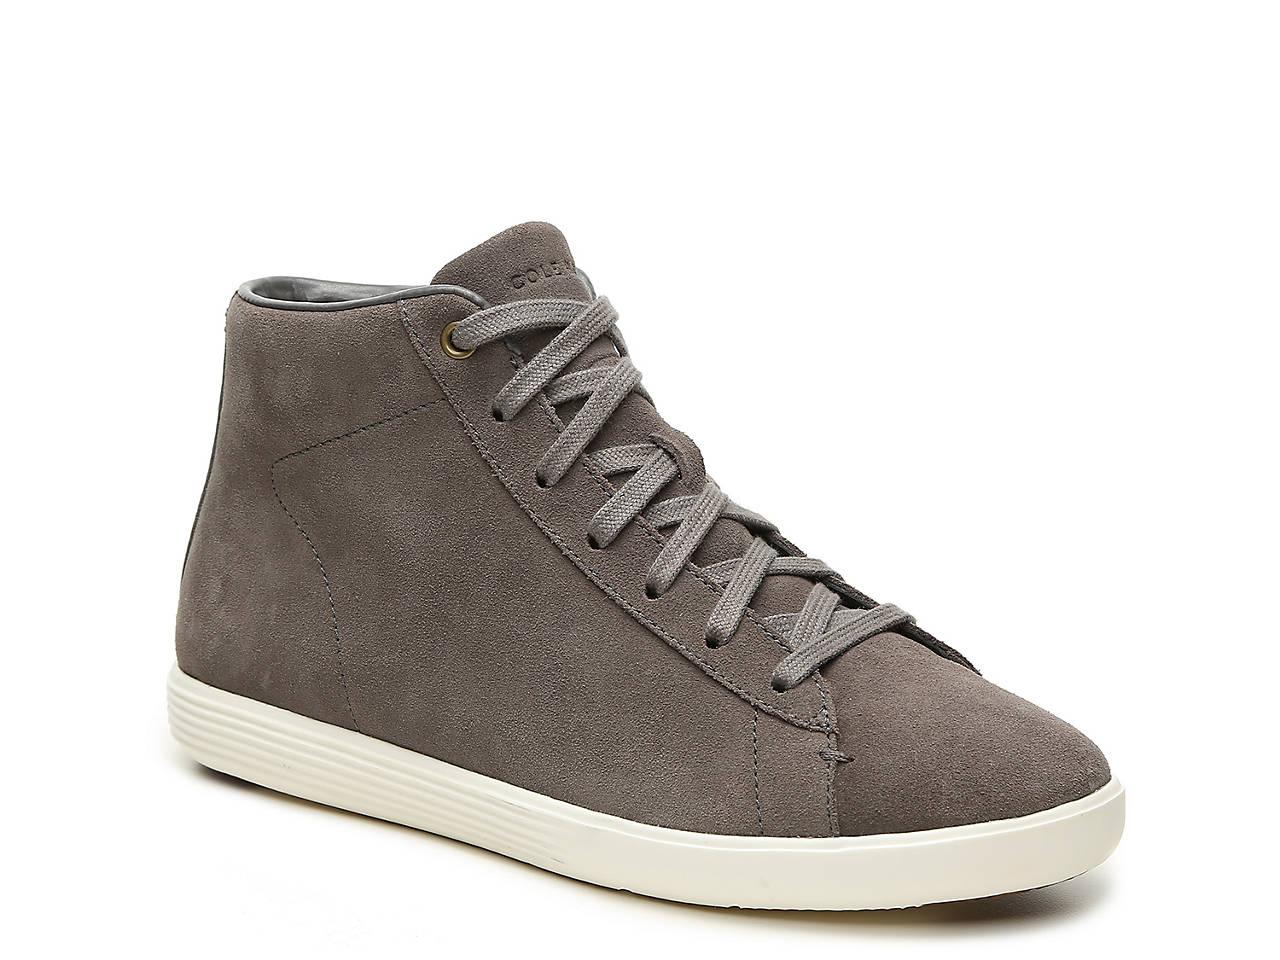 e9b4c8daa0c Cole Haan Grand Crosscourt High-Top Sneaker - Women's Women's Shoes ...